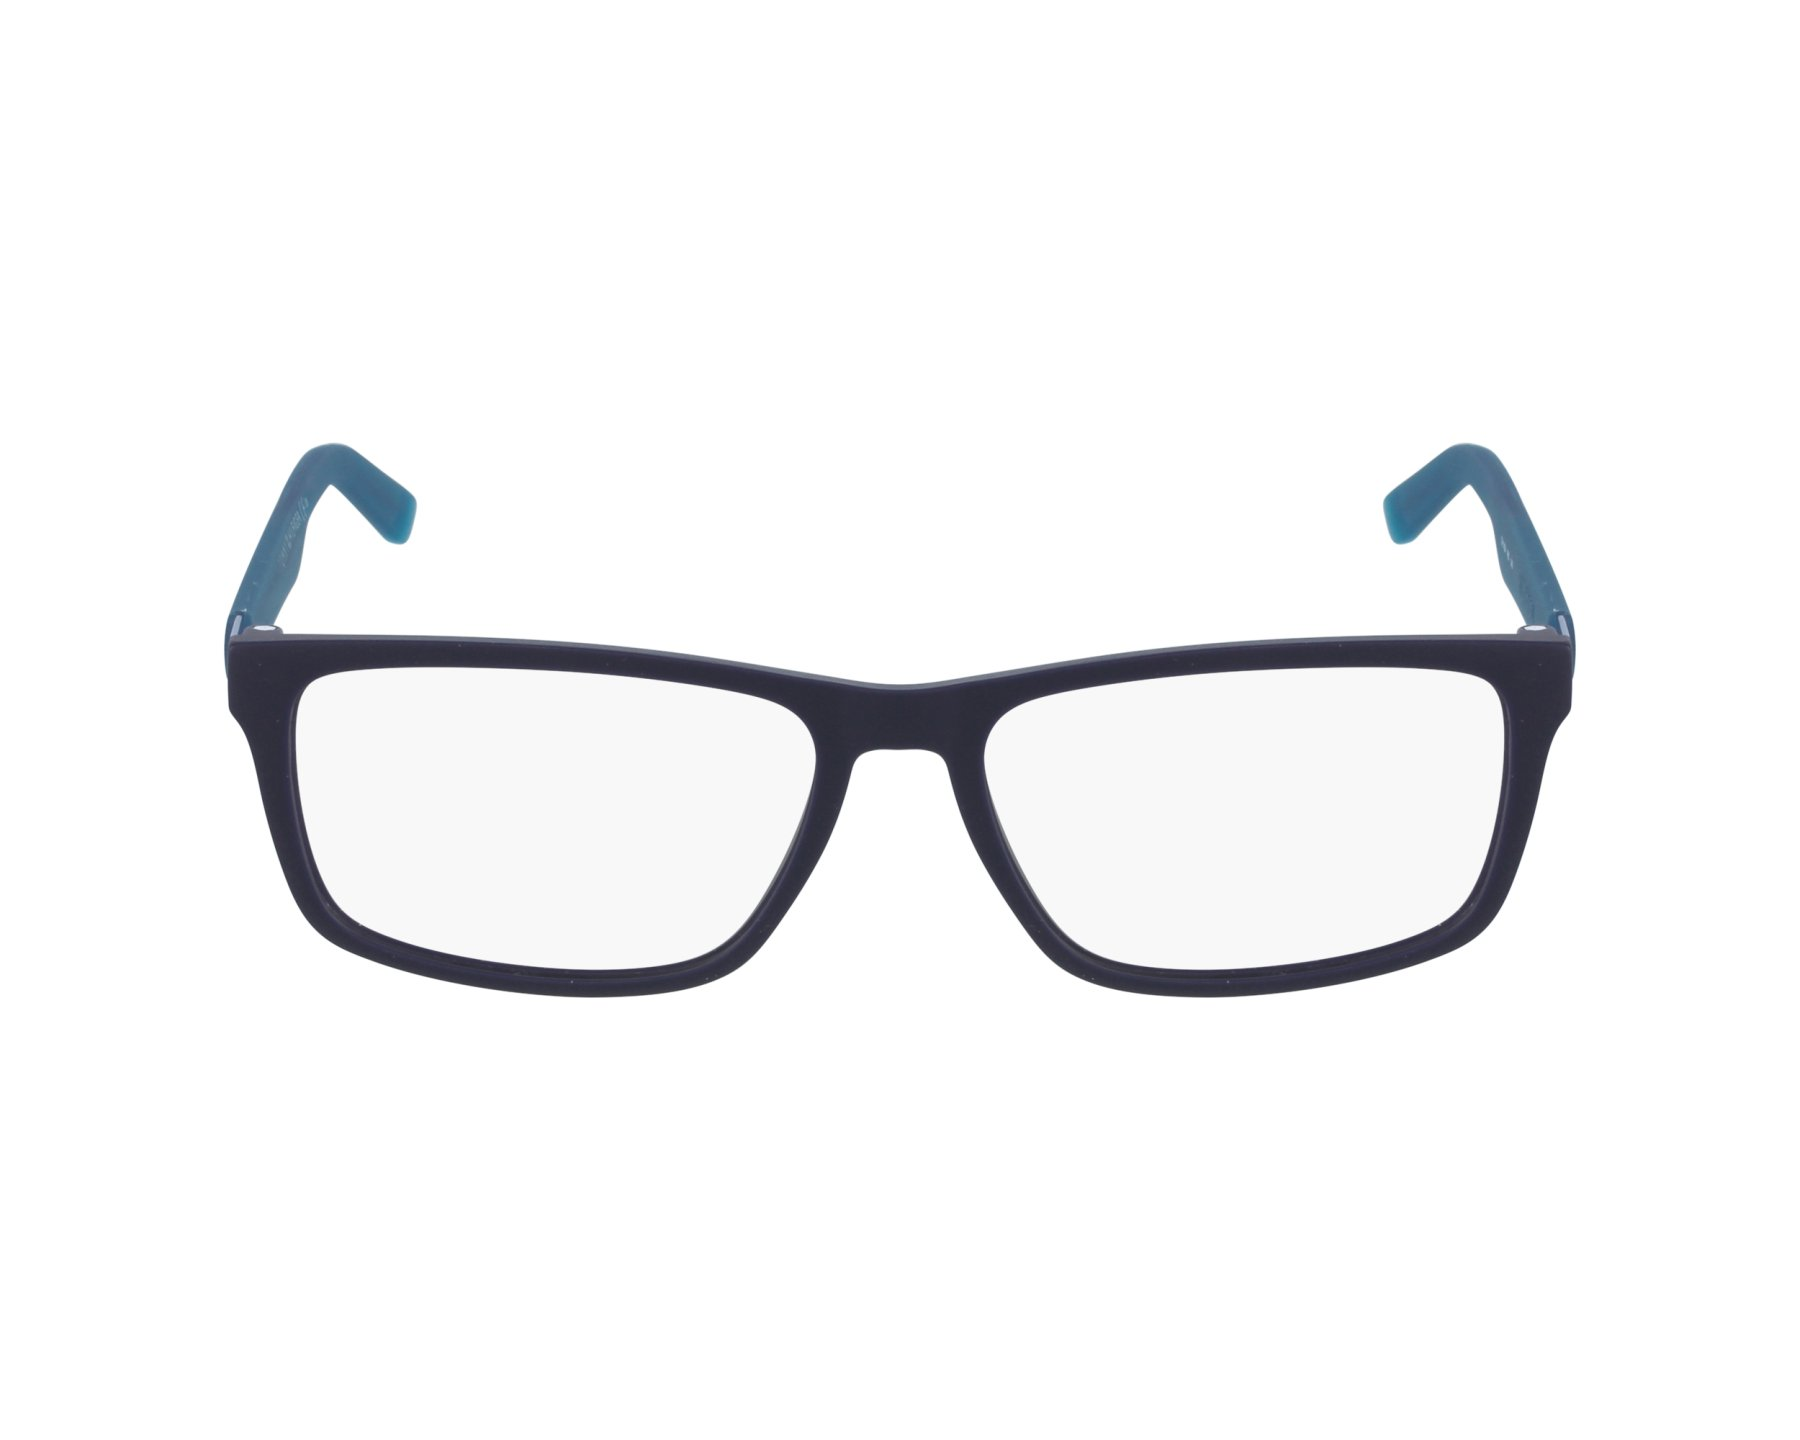 b1798bdfe36 eyeglasses Tommy Hilfiger TH-1404 R61 - Blue denim Blue profile view